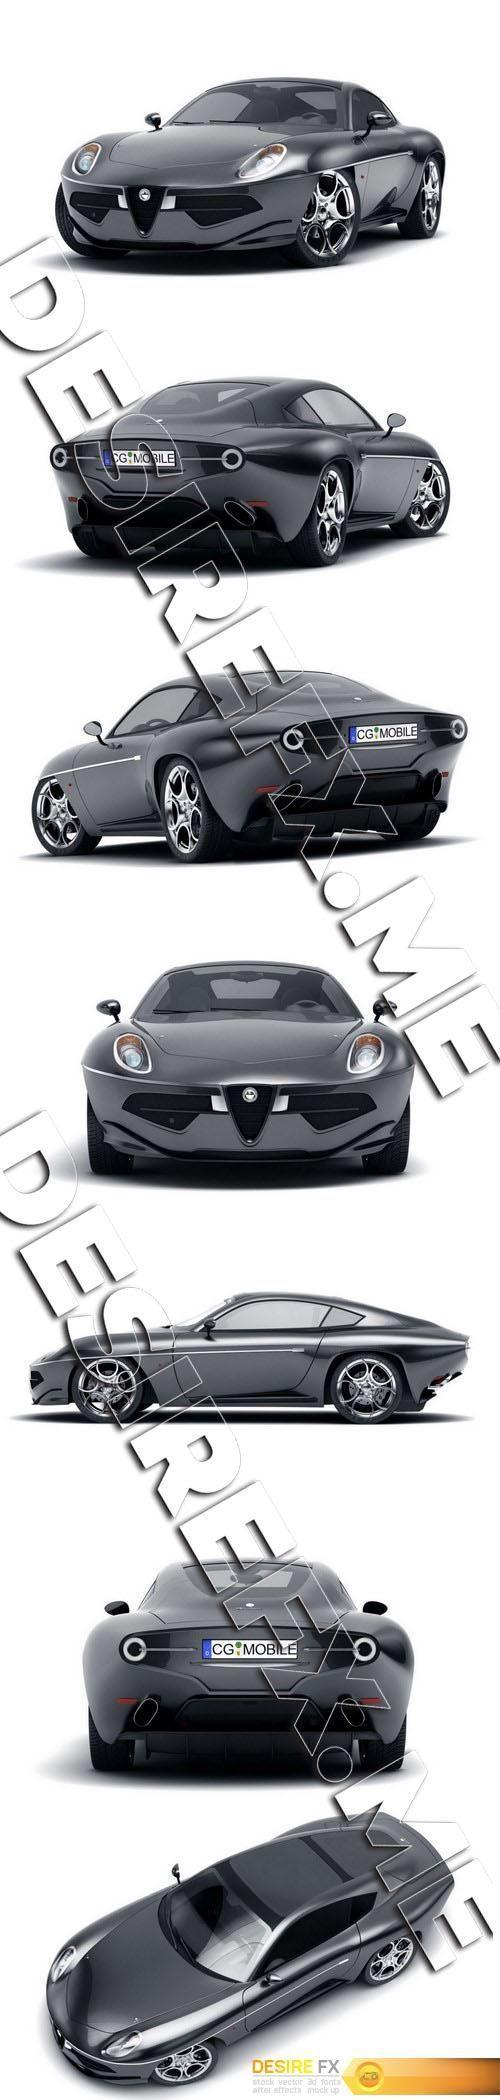 Alfa Romeo Disco Volante Touring 2013 3D Model    #Alfa_Romeo_Disco_Volanteo_Touring_2013 #3D_Model #Alfa_Romeo #2013    http://www.desirefx.me/alfa-romeo-disco-volante-touring-2013-3d-model/ #alfaromeodiscovolante